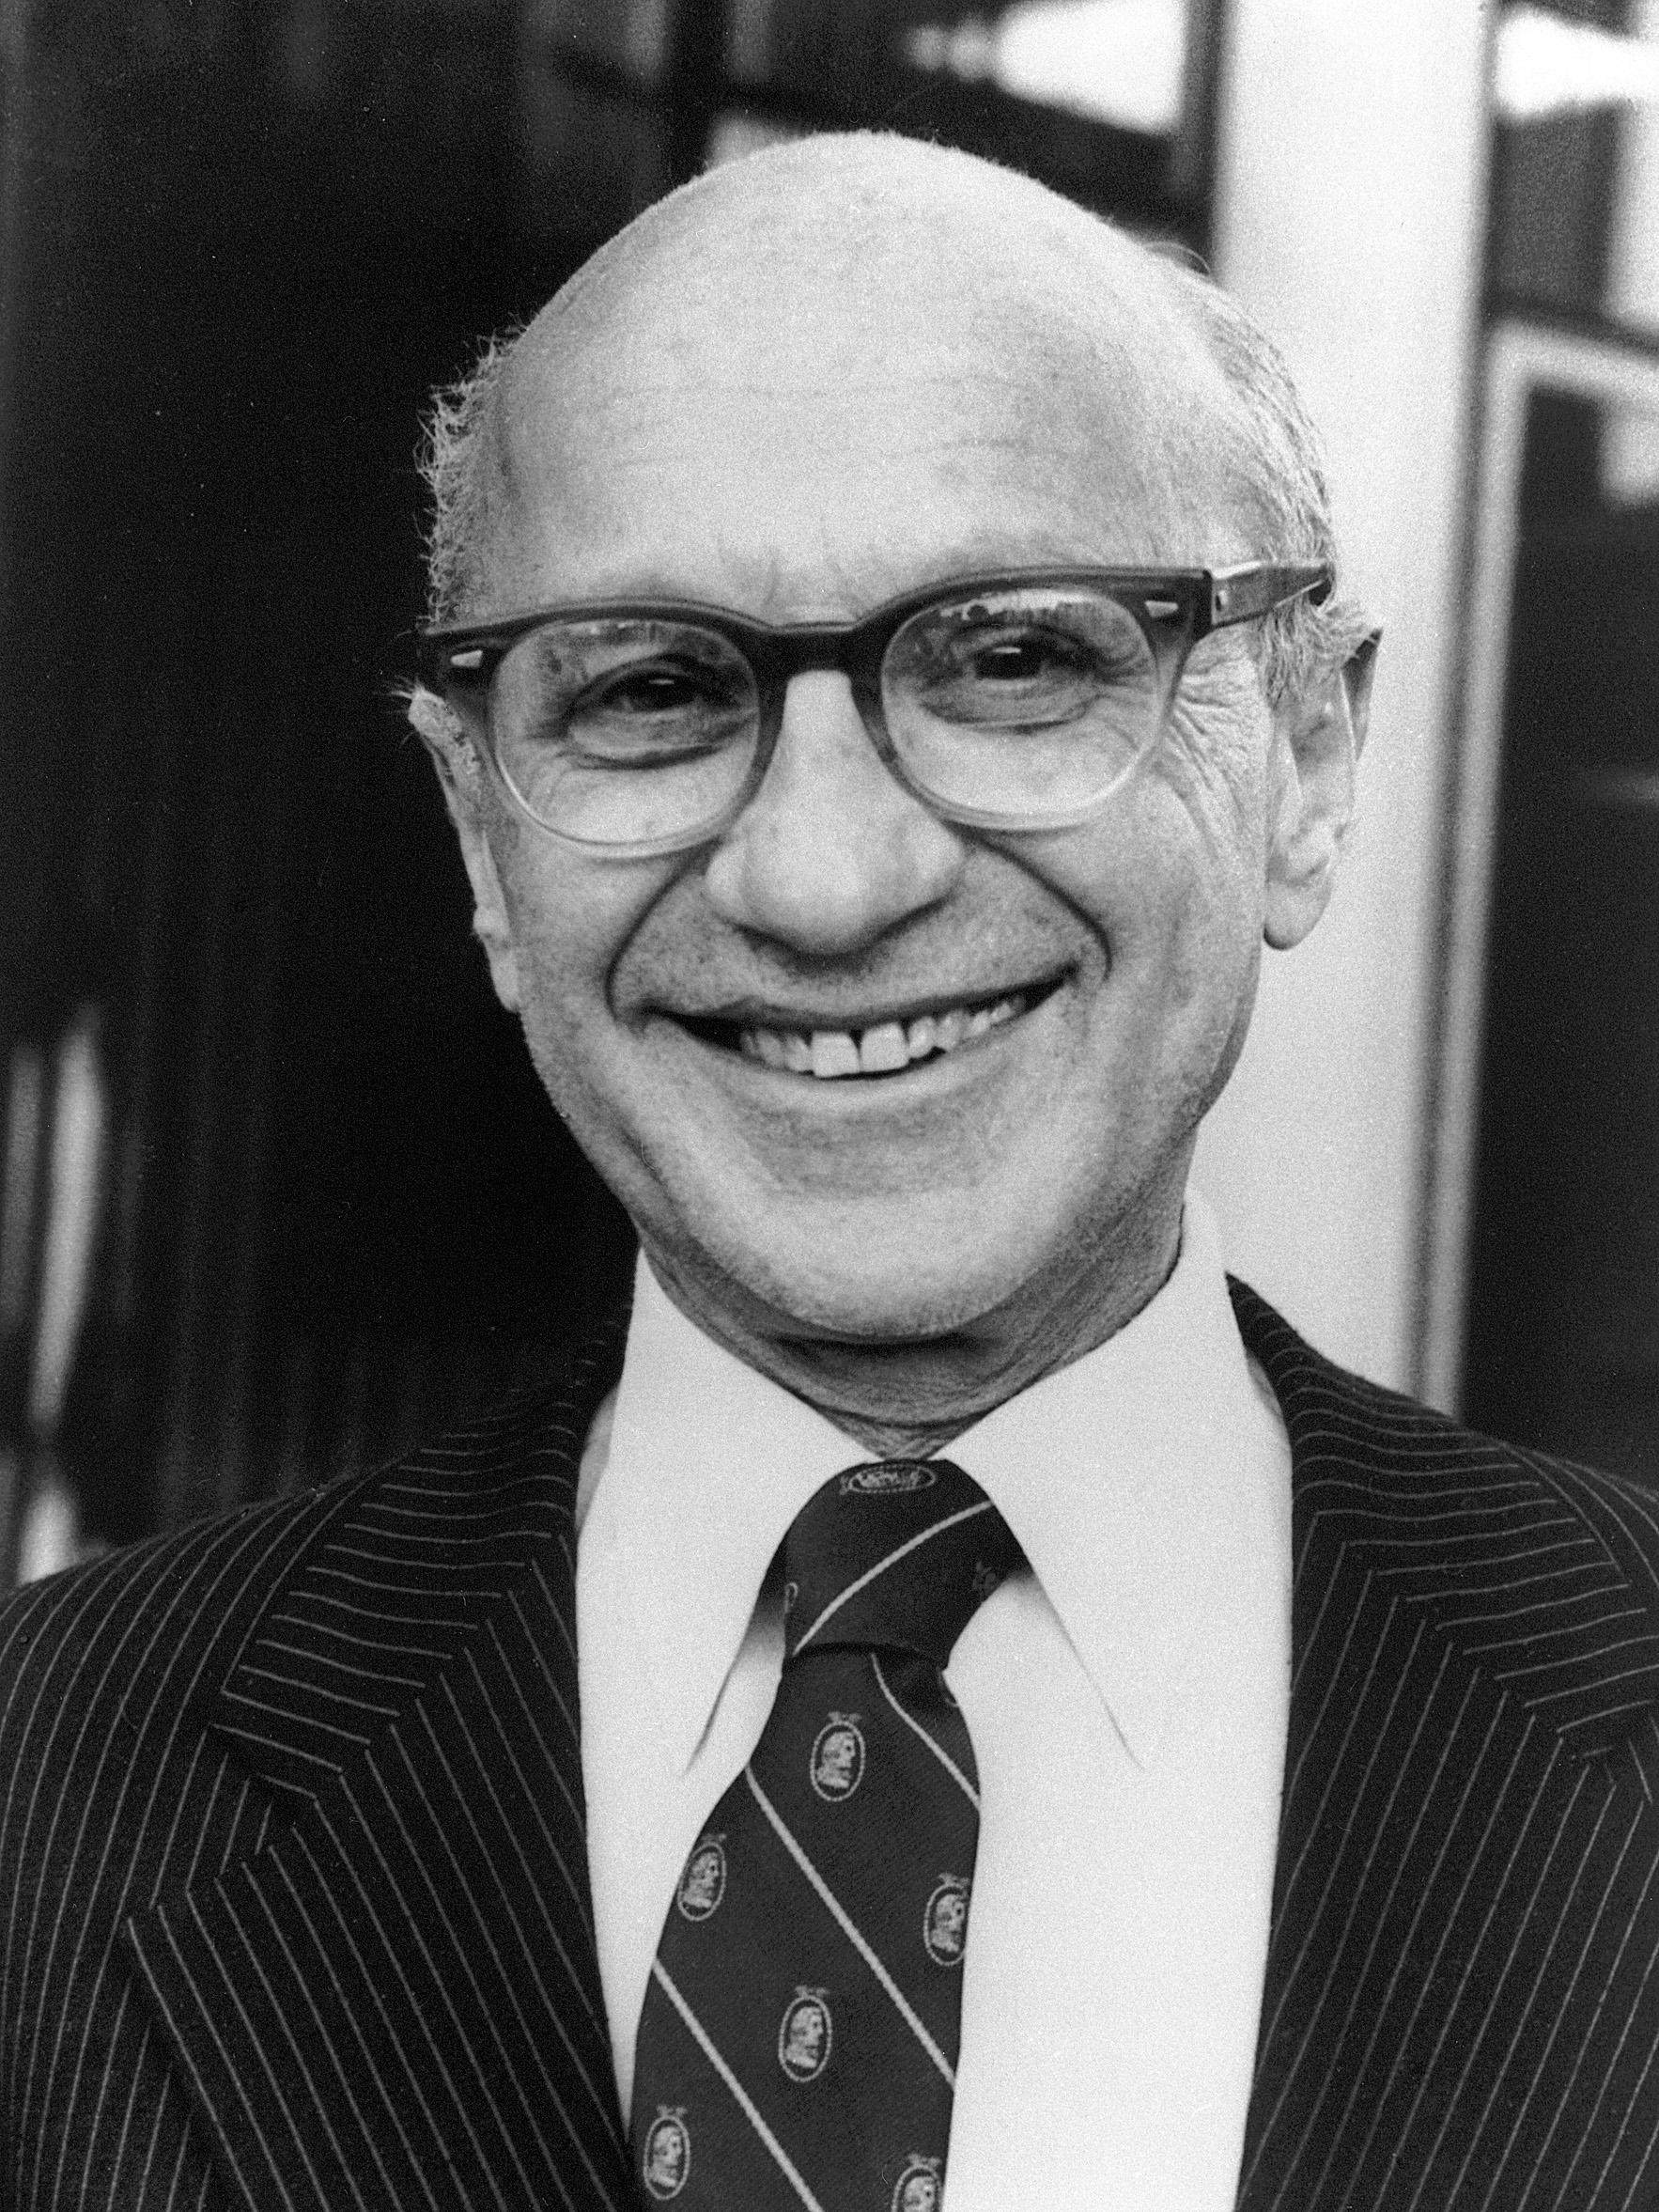 Milton Friedman Quotes Journal Quixoticjourney